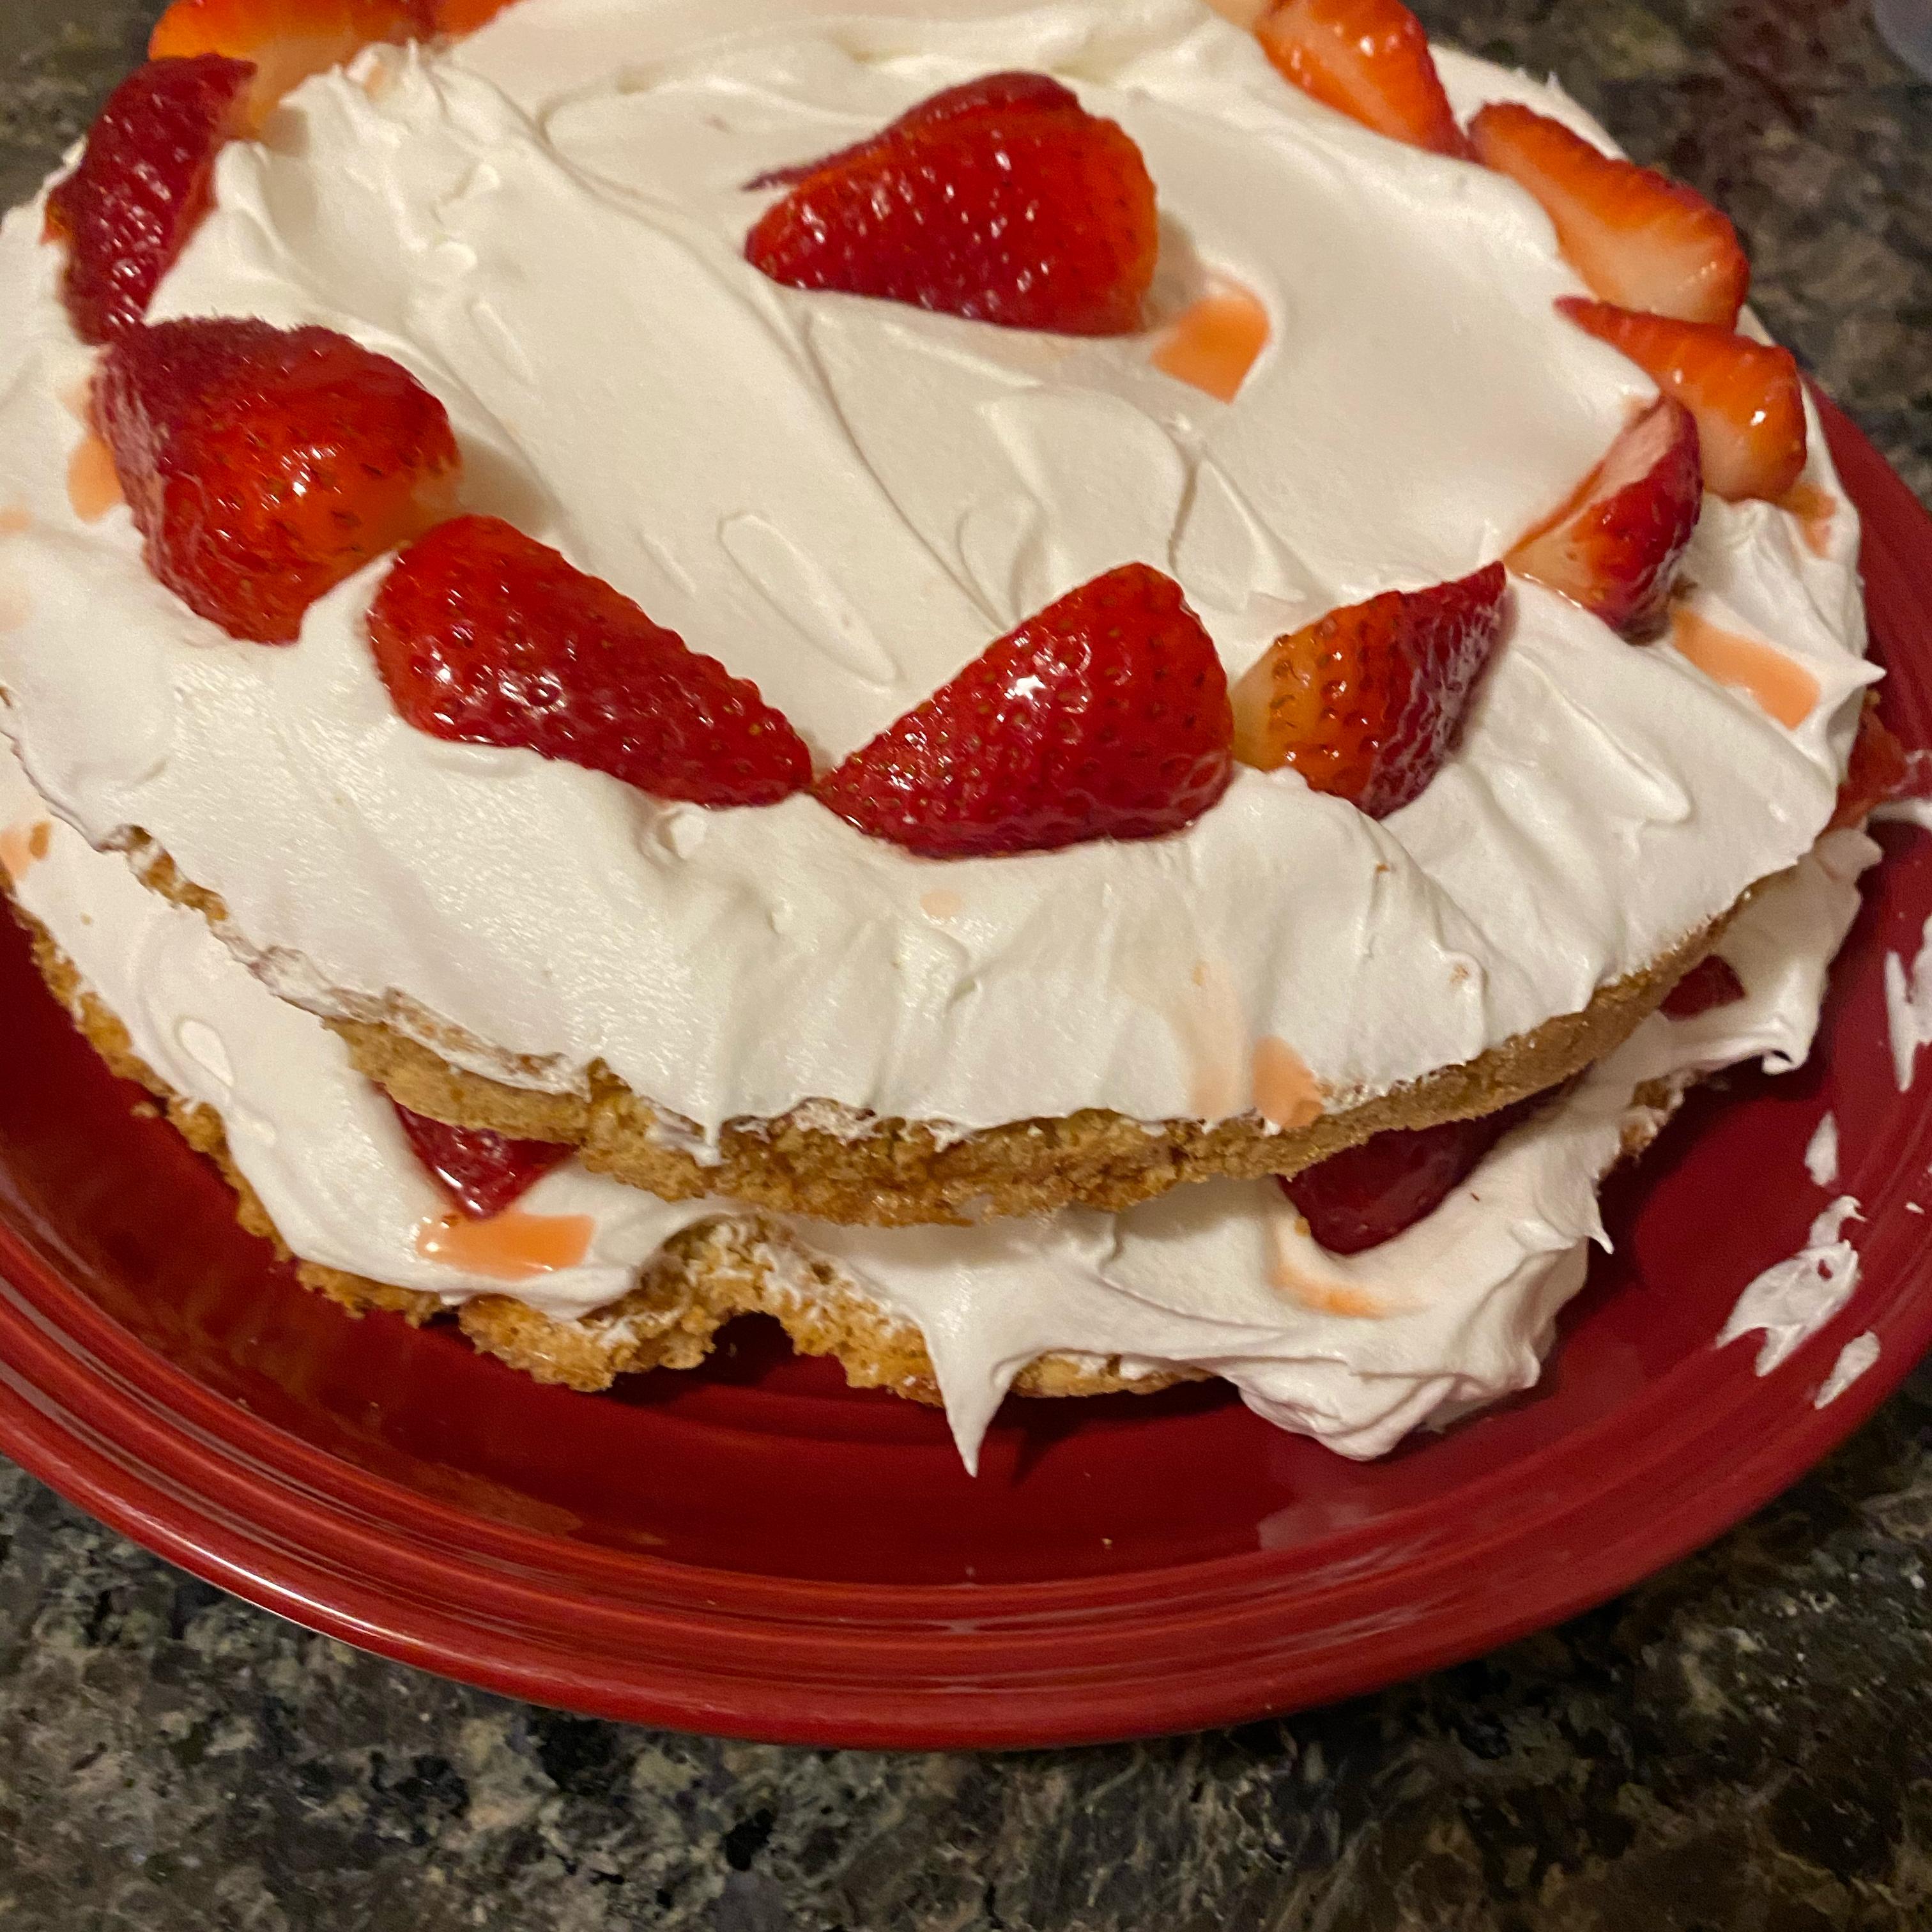 Sensational Strawberry Shortcake Chanel's mom